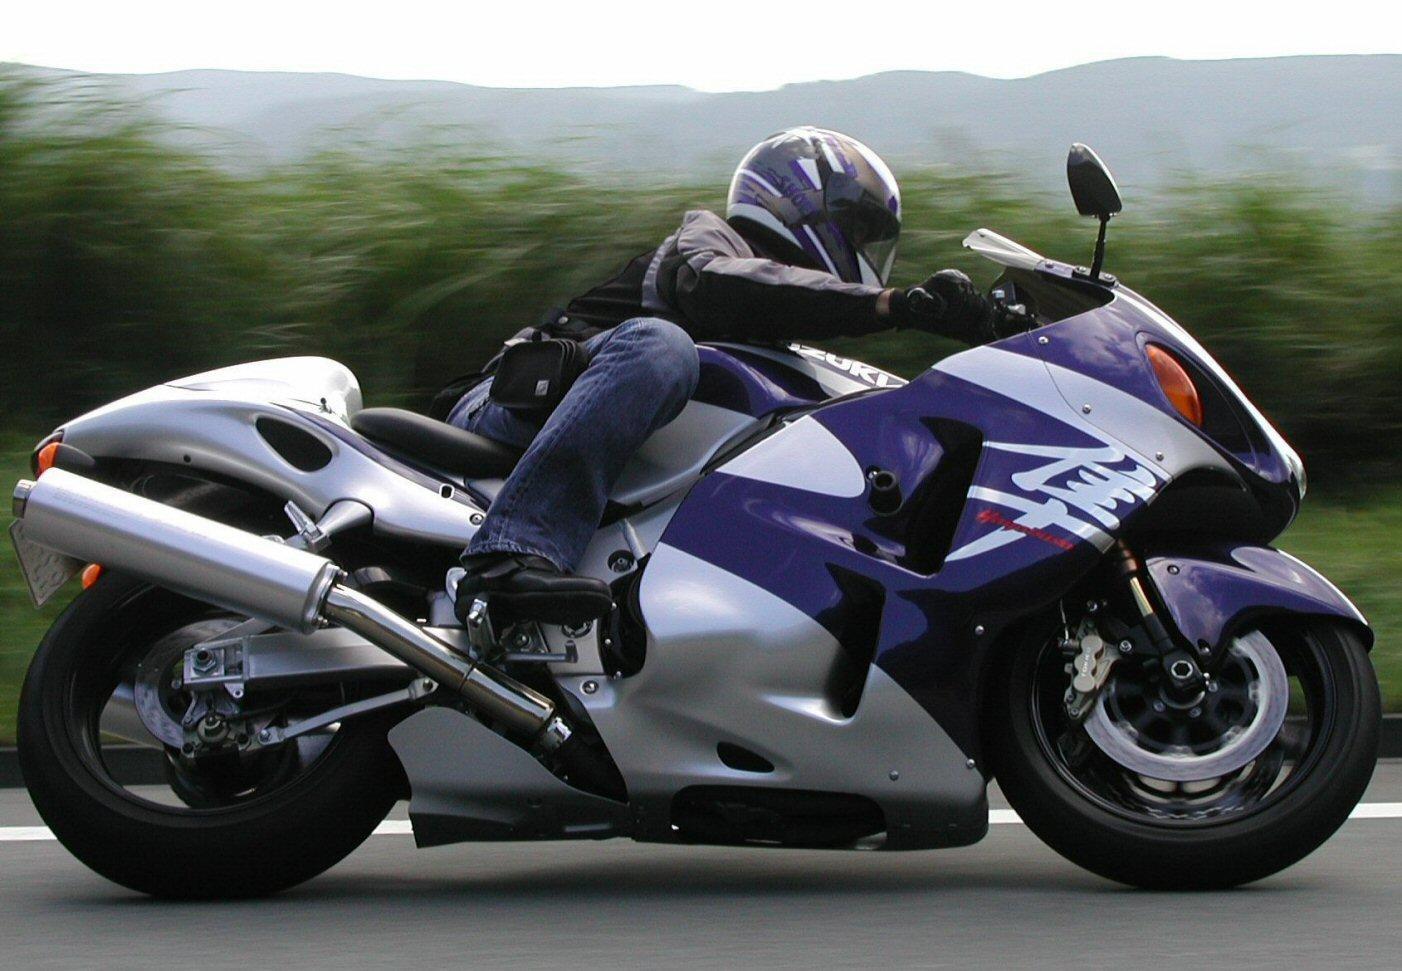 Обзор мотоцикла Suzuki GSX1300R Hayabusa